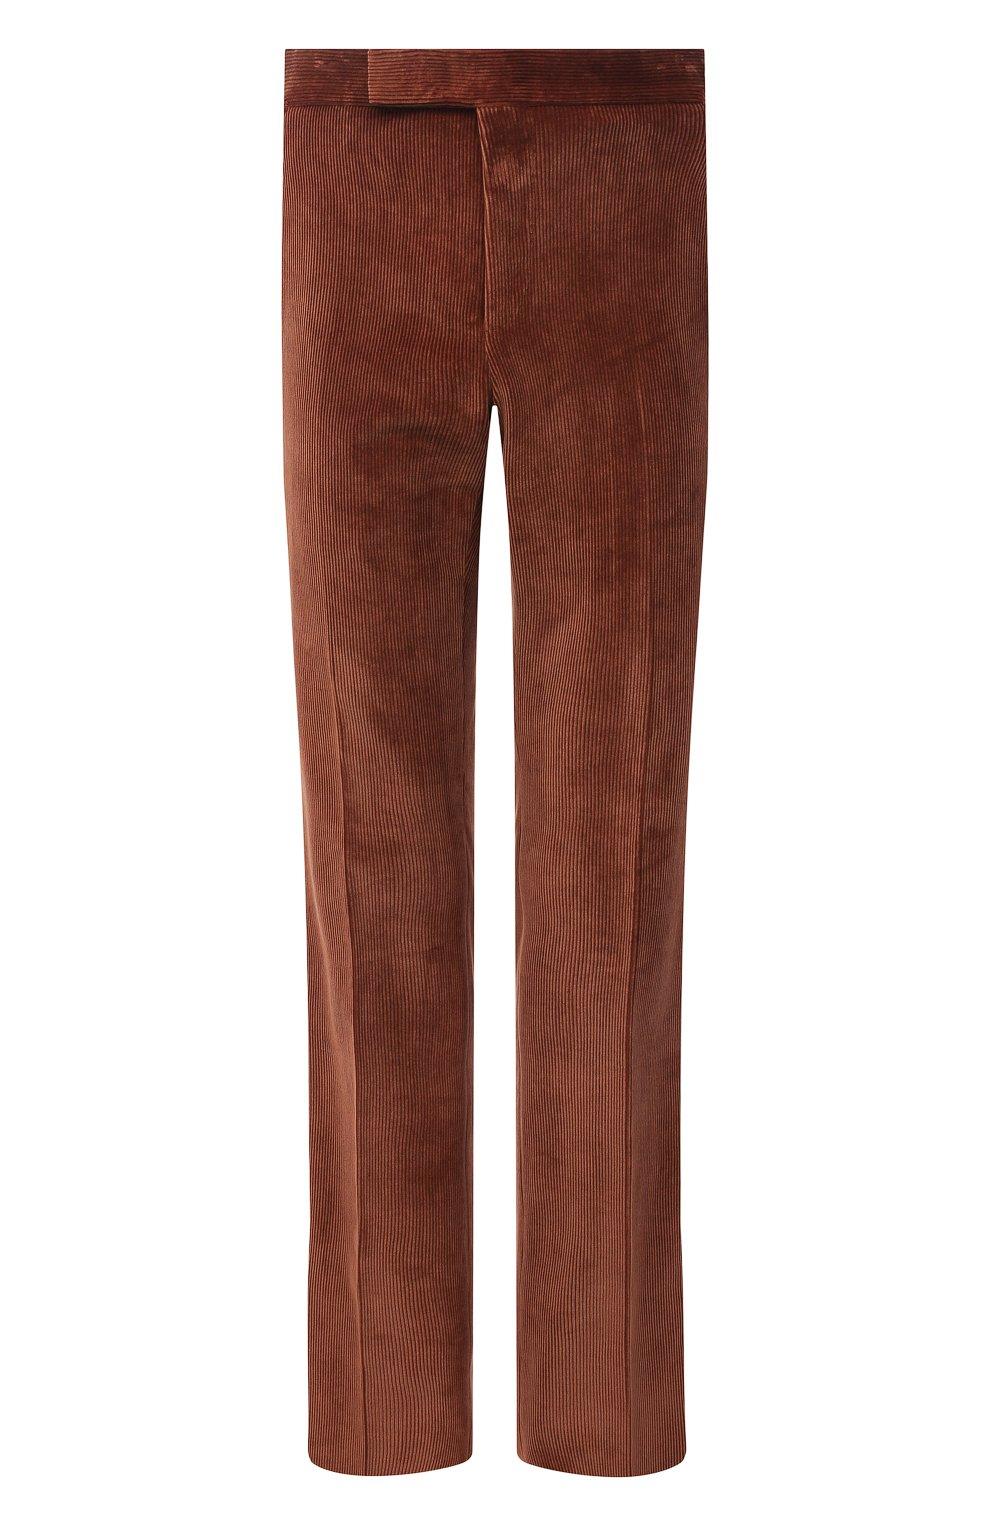 Мужские брюки TOM FORD коричневого цвета, арт. 2VER24/610041 | Фото 1